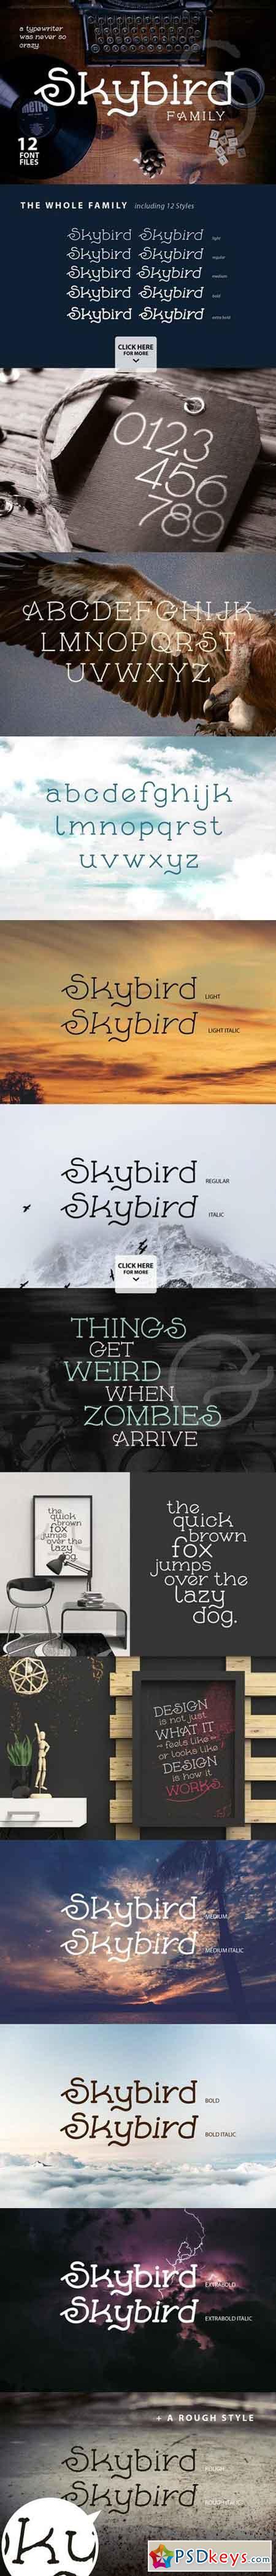 Skybird Font Family 697675